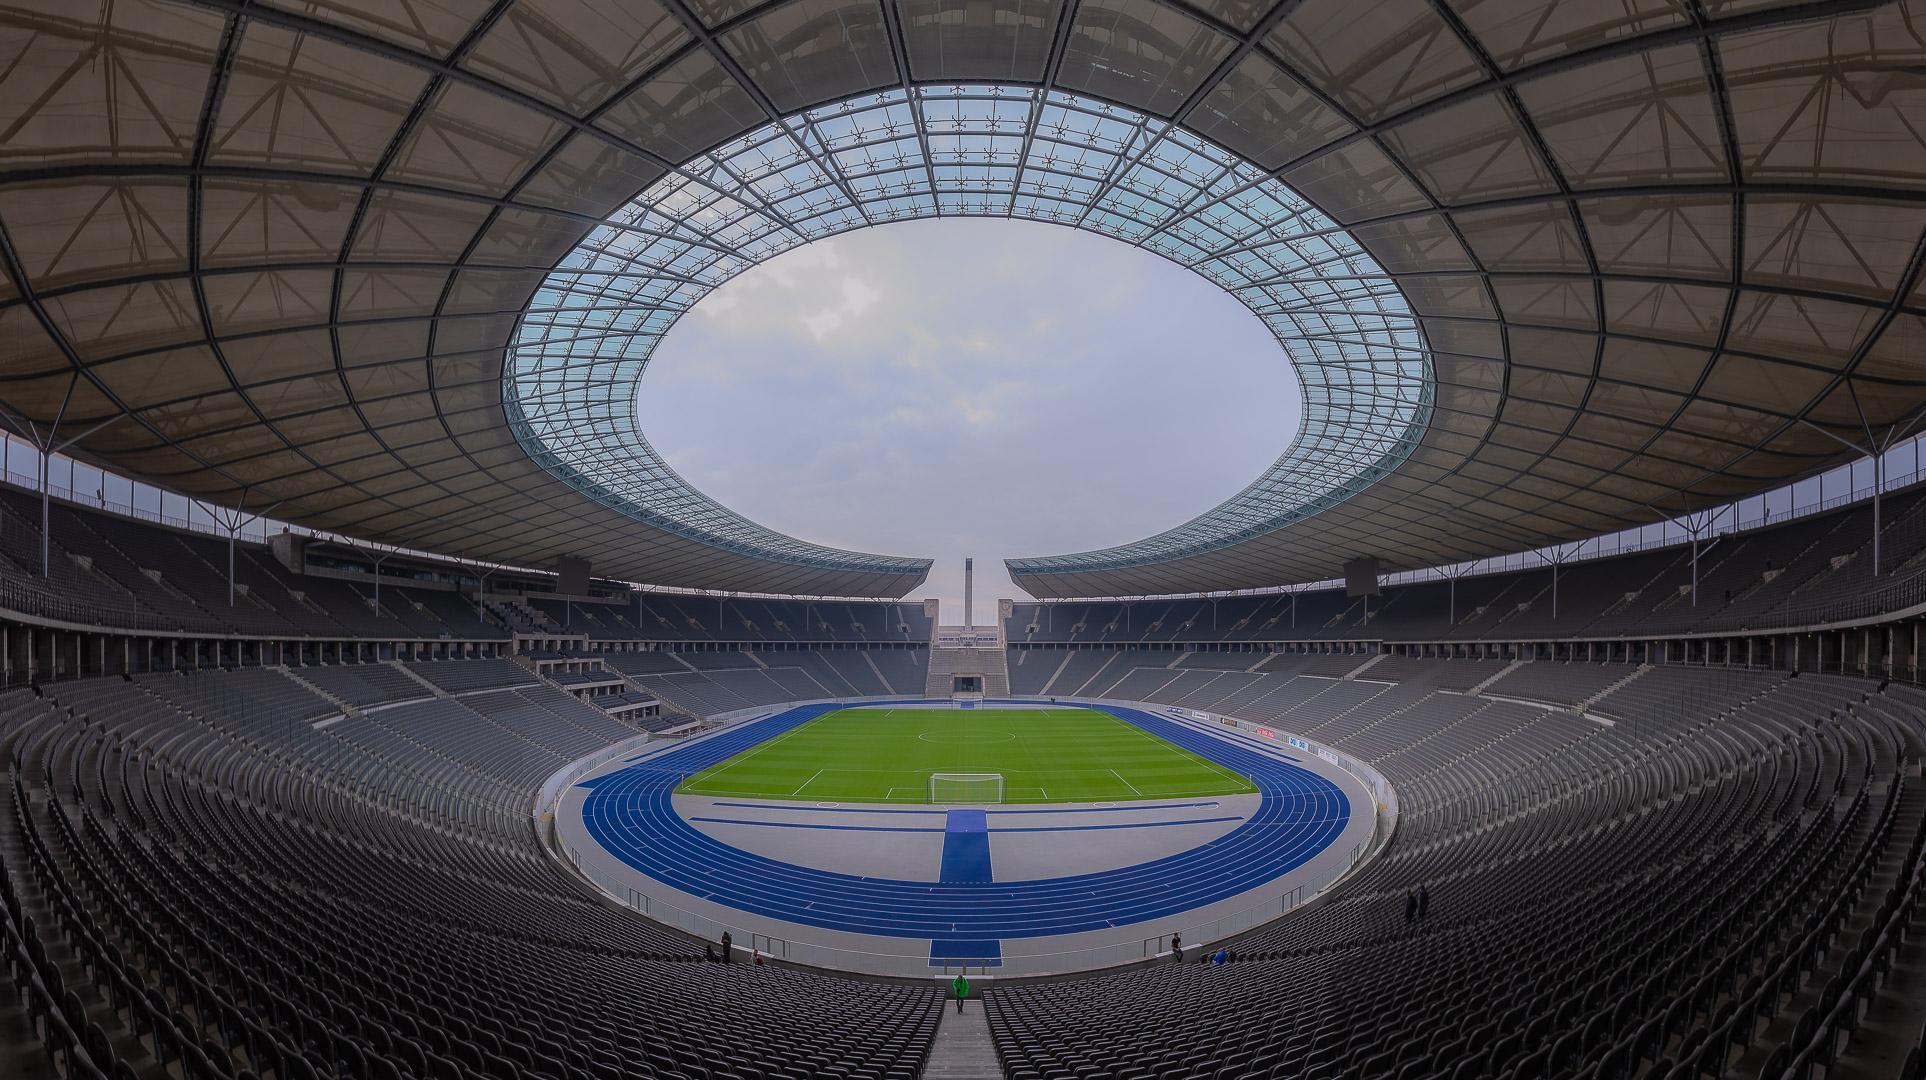 Arena / stadion